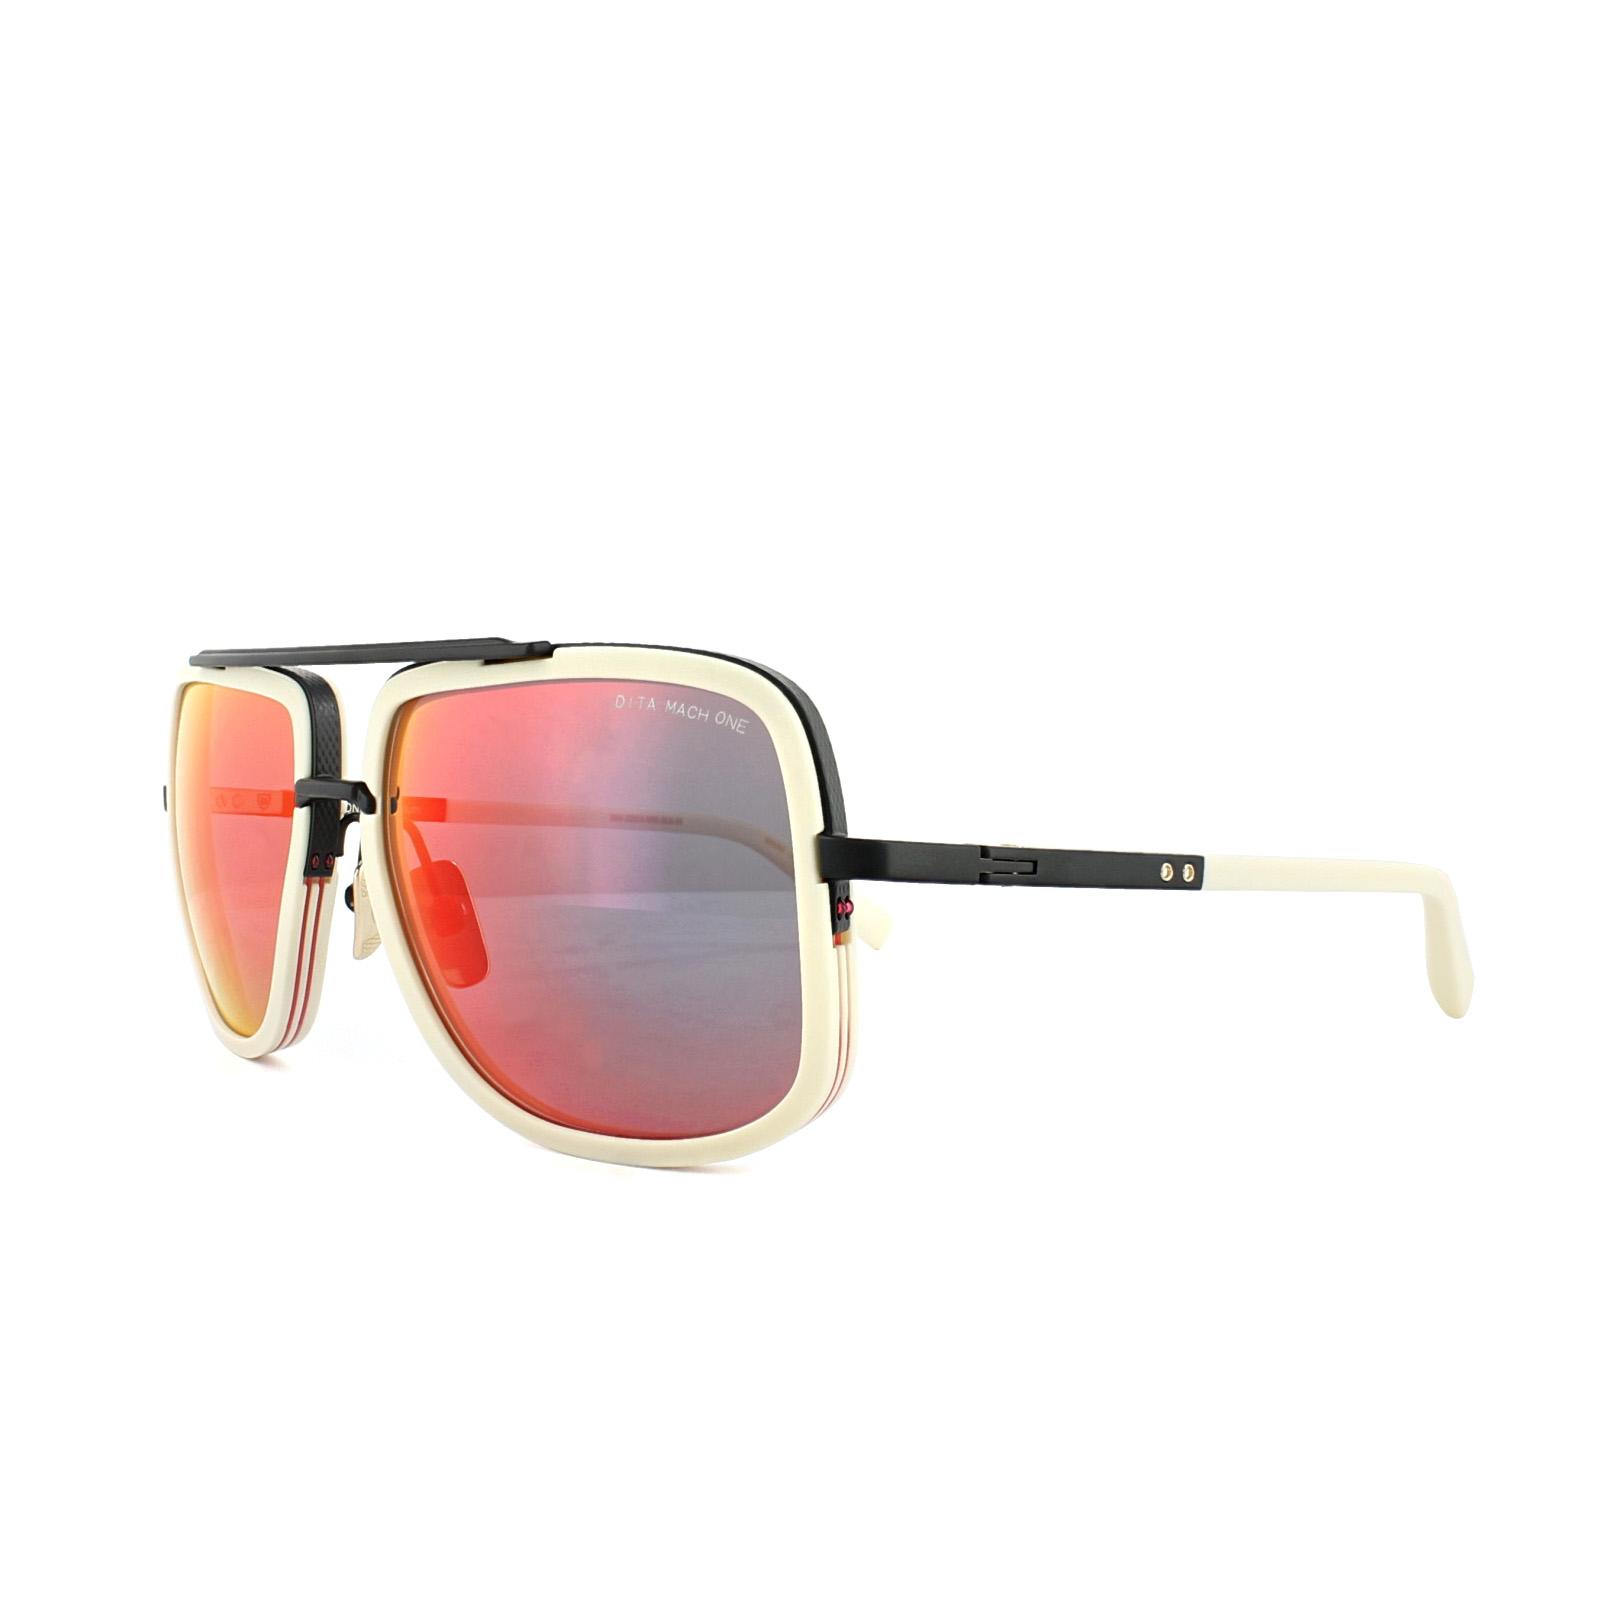 958e357516b6 Dita Sunglasses Mach-One DRX-2030-K-59 Matt Bone Matt Black Grey ...